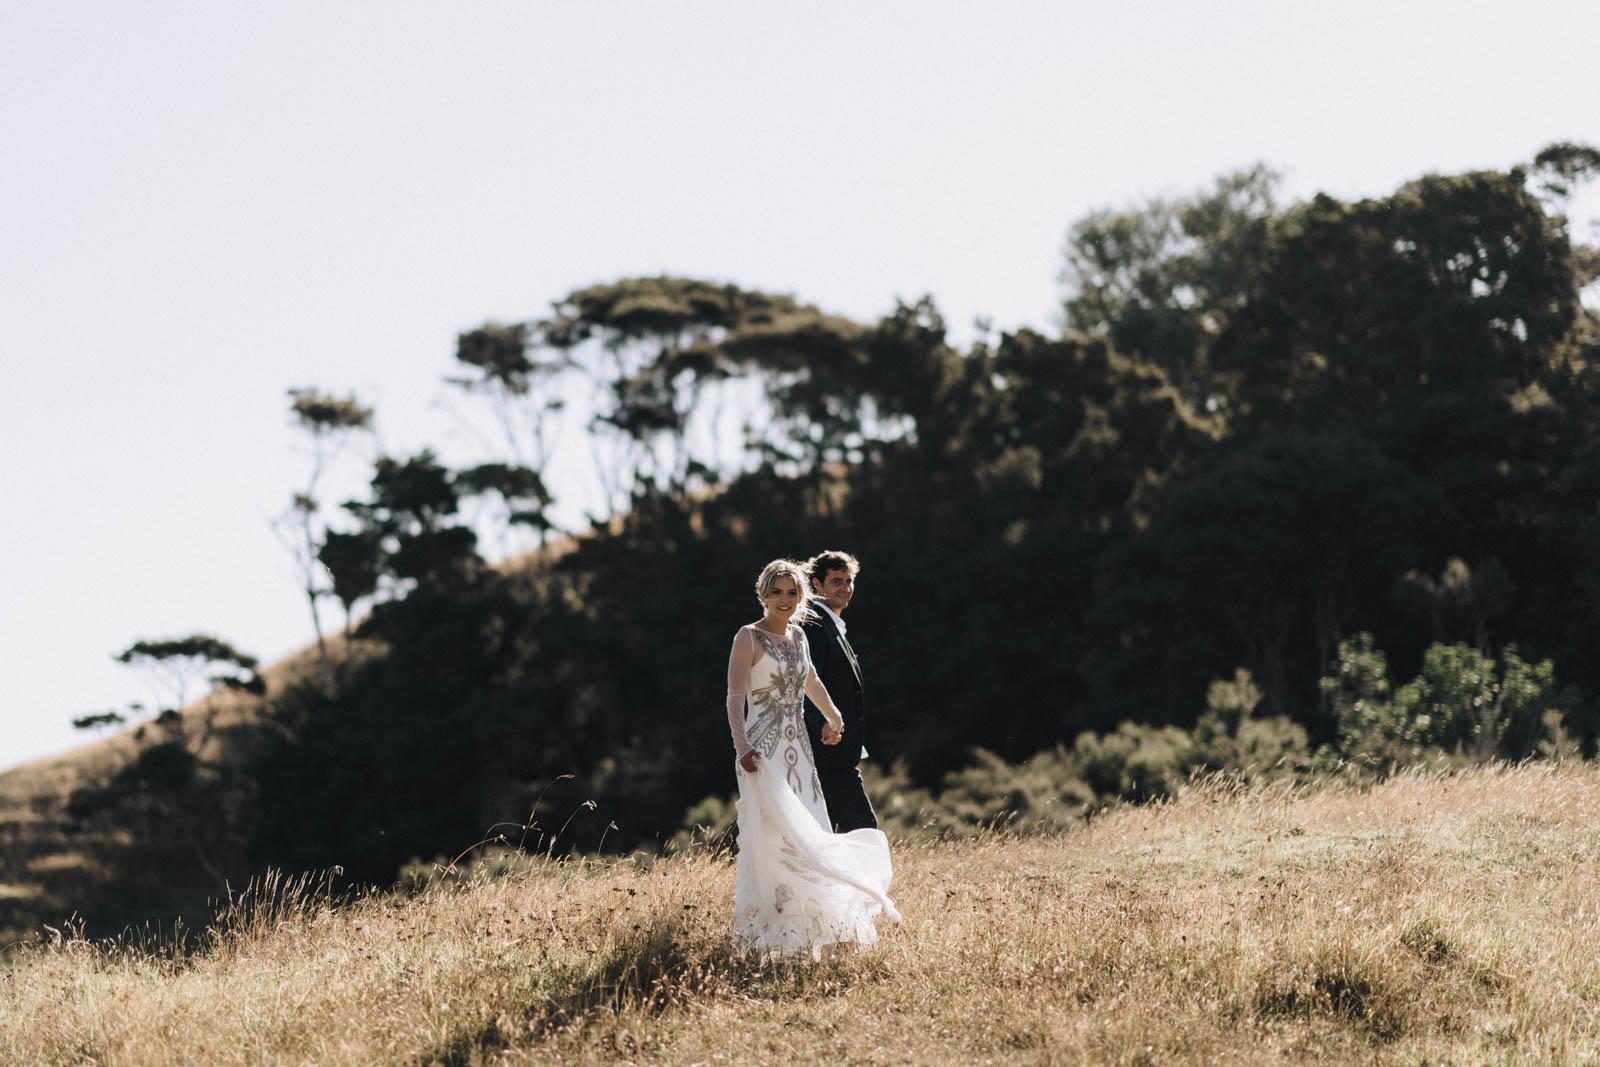 newfound-l-i-coromandel-wedding-photographer-1732-A9_03783